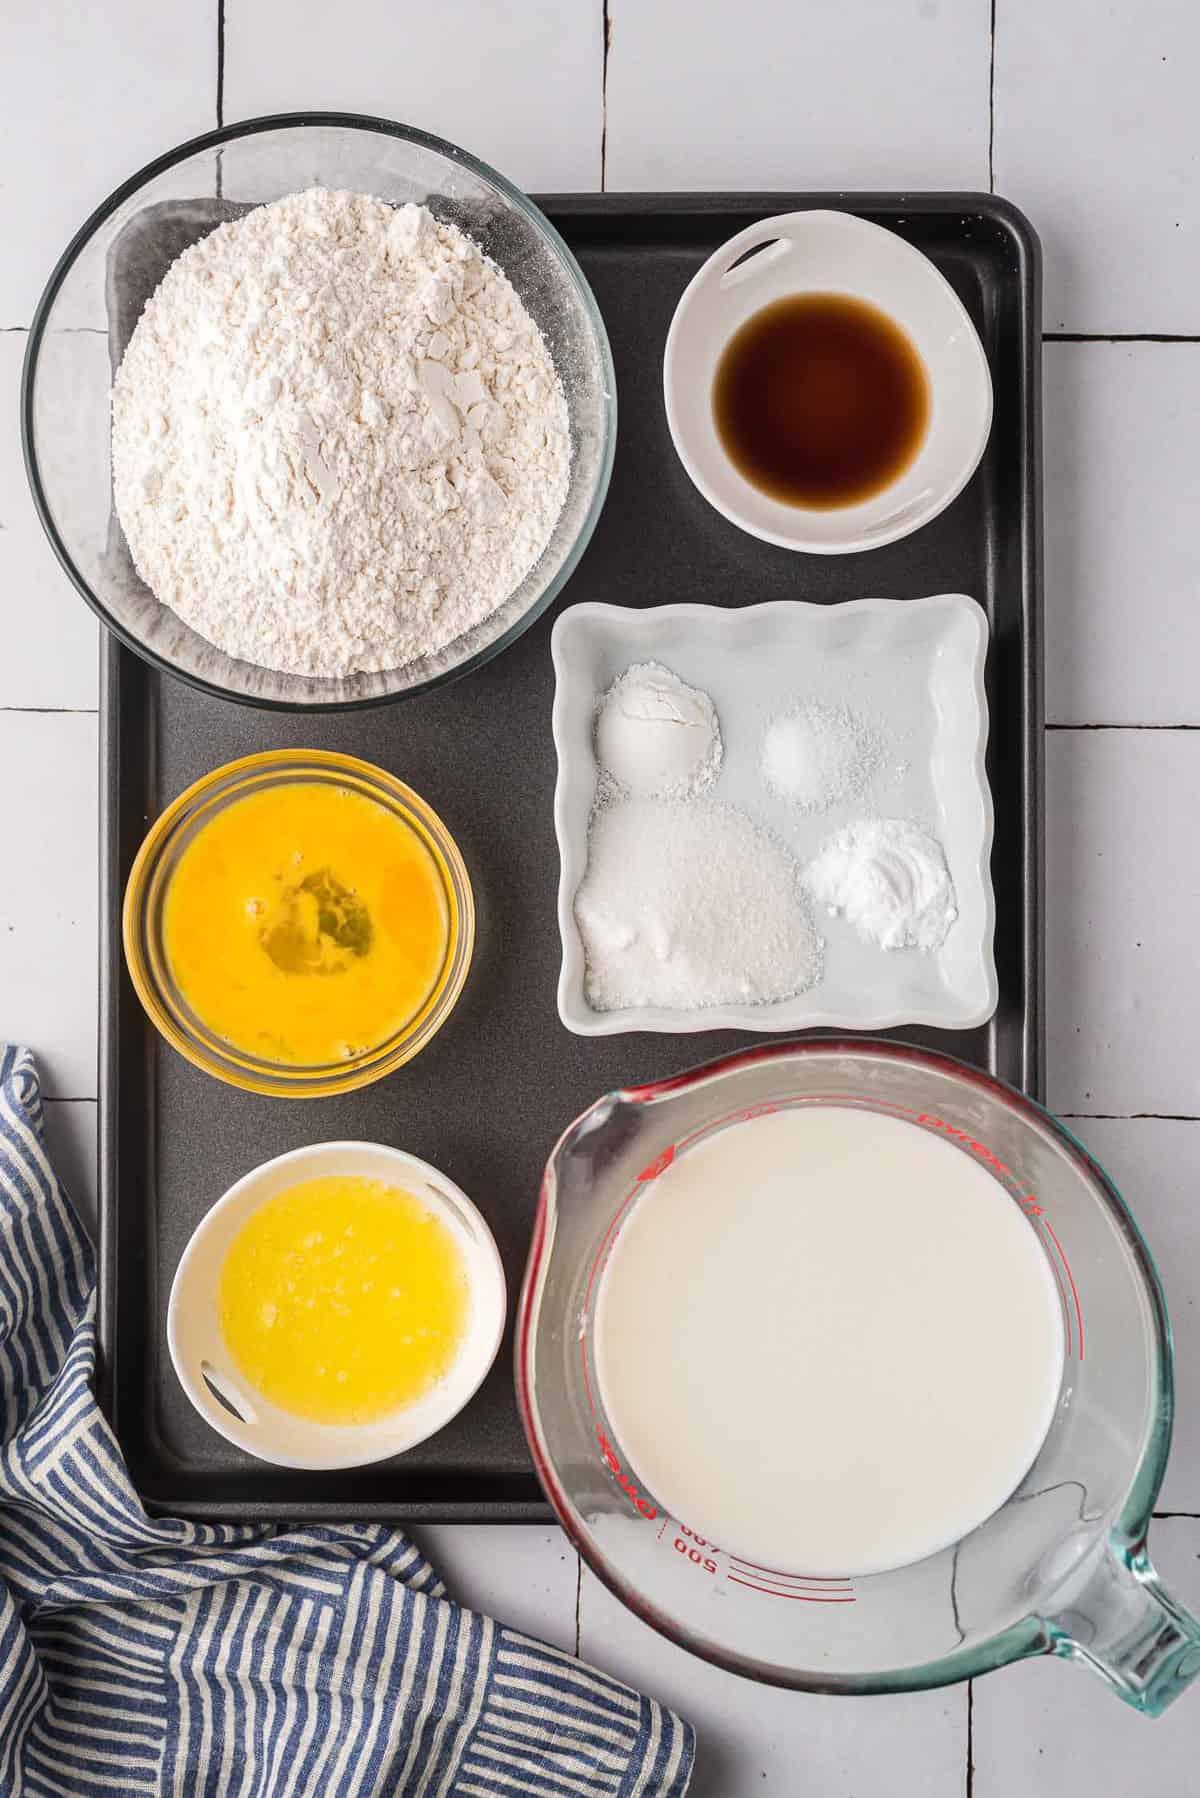 Ingredients on a black sheet pan: flour, eggs, vanilla, milk, butter, baking soda, baking powder, salt.